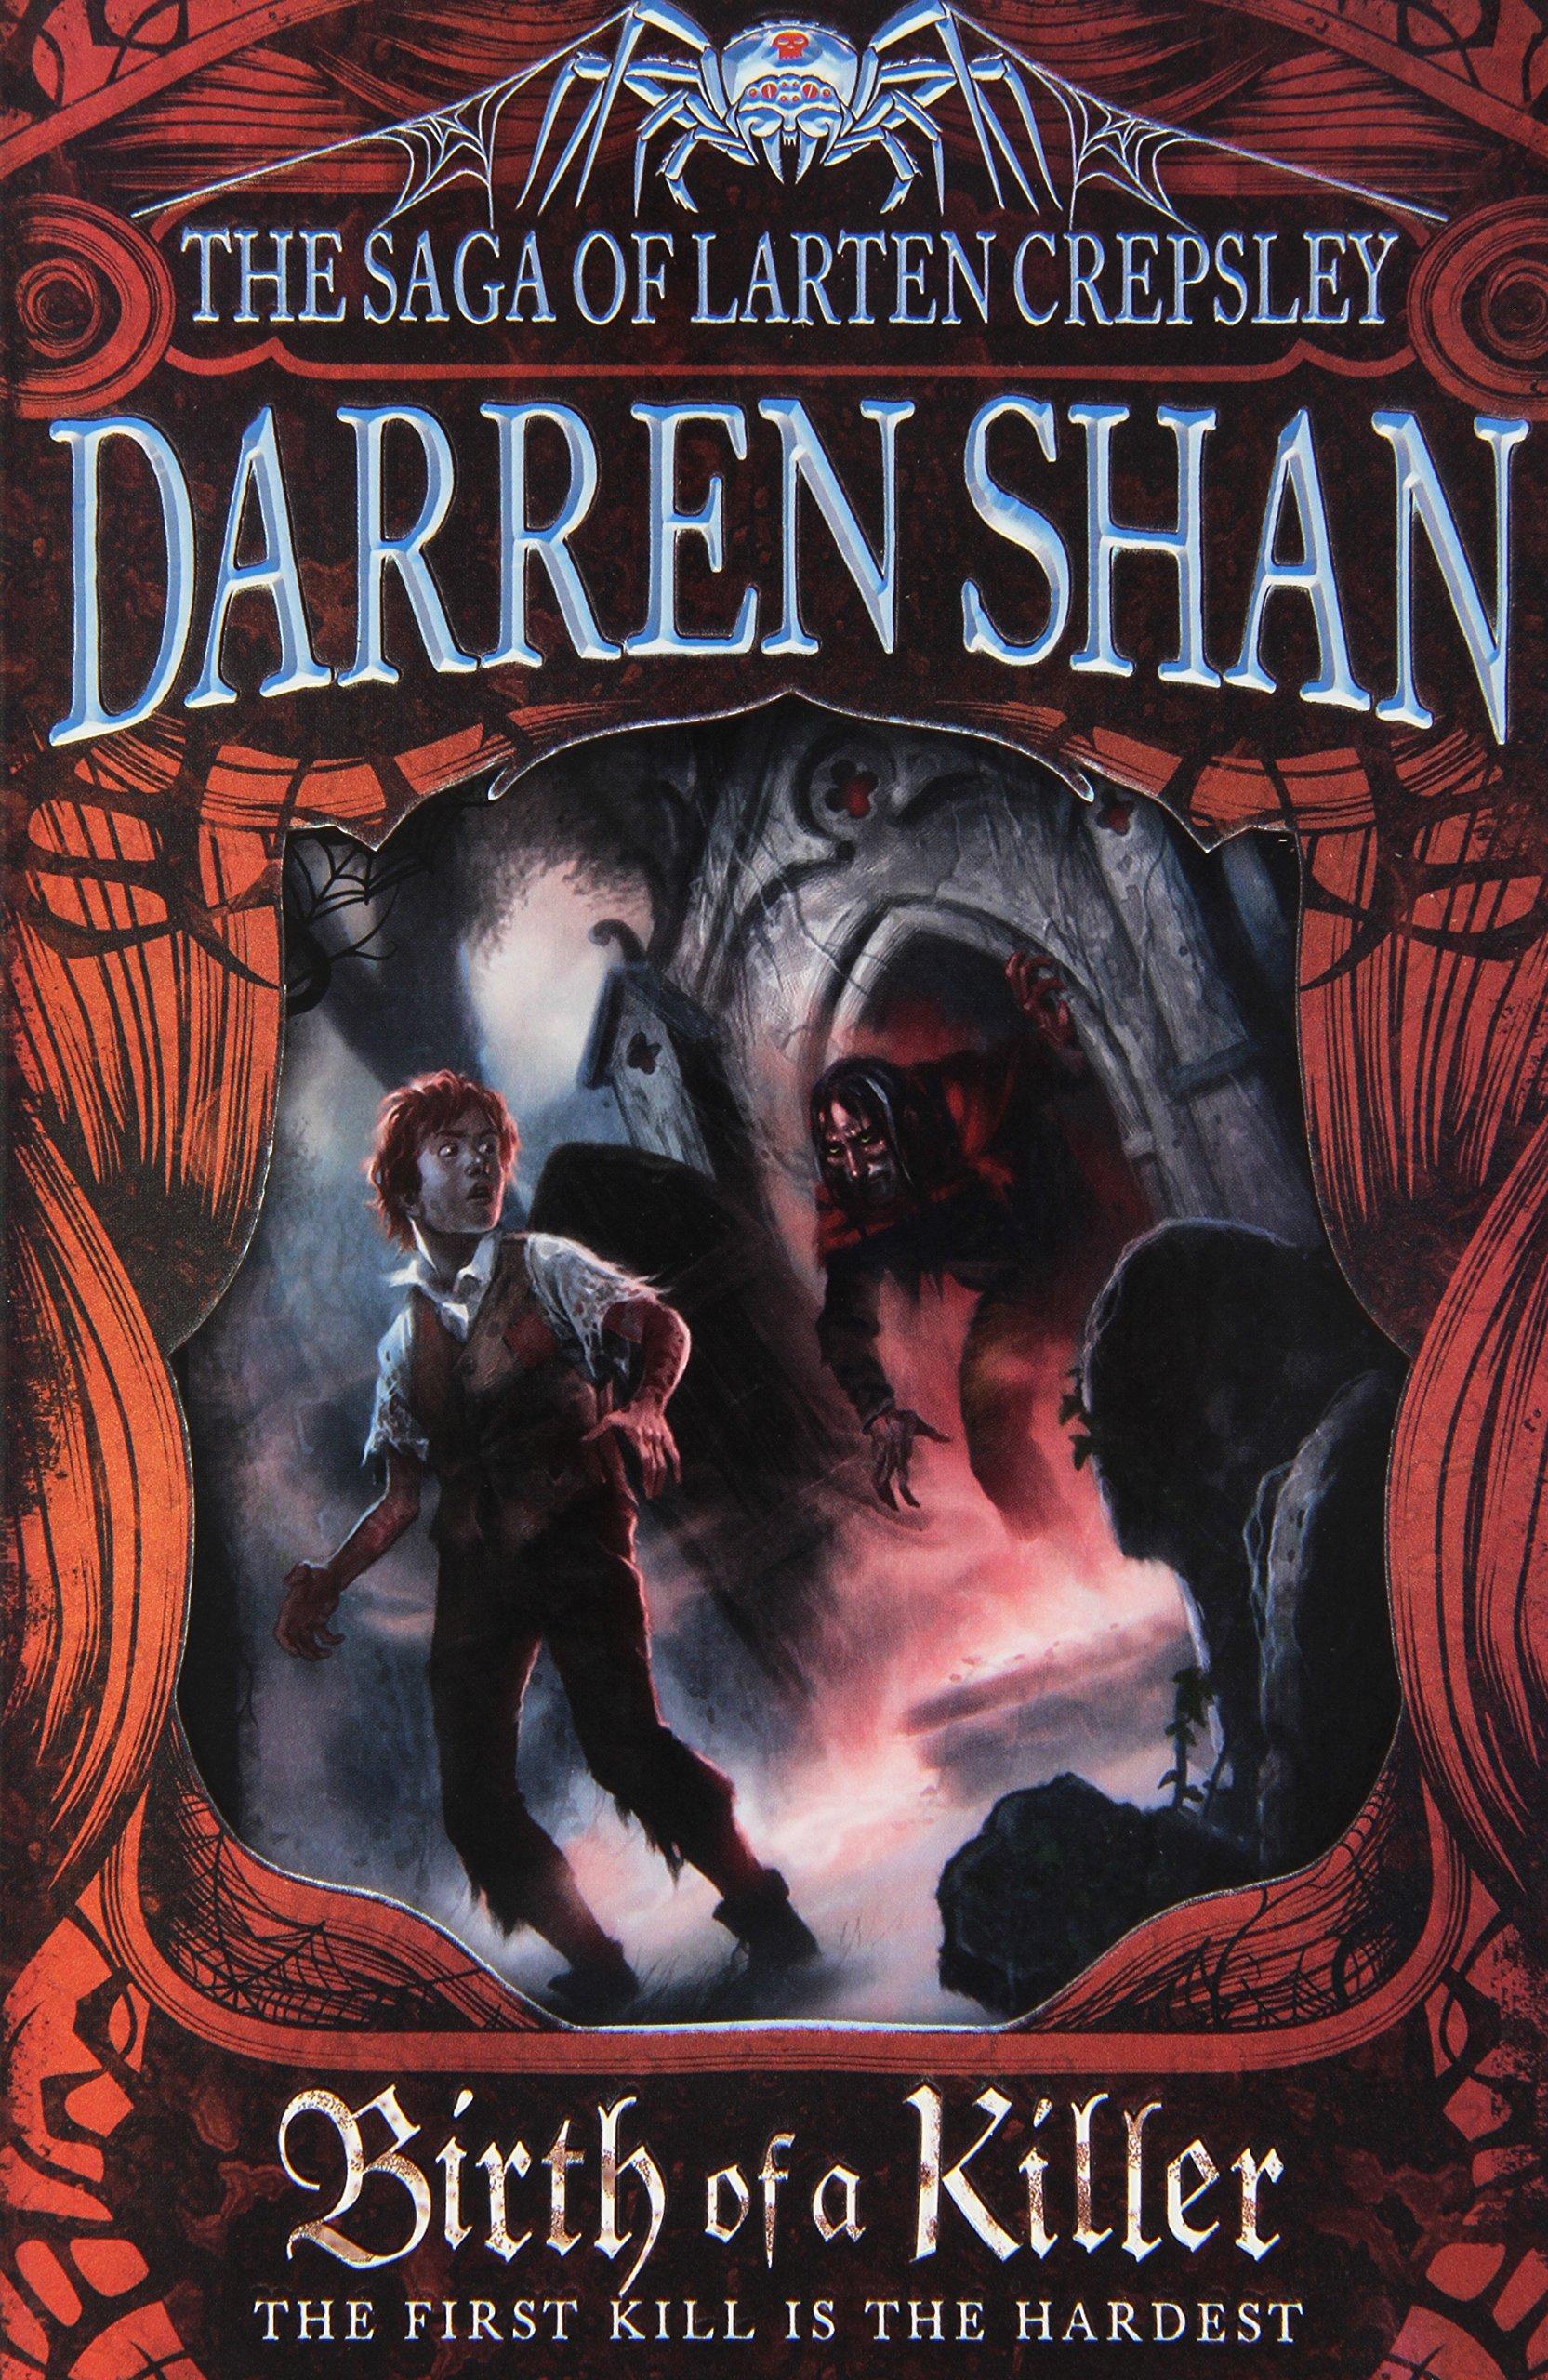 Birth of a Killer (The Saga of Larten Crepsley, Band 1)